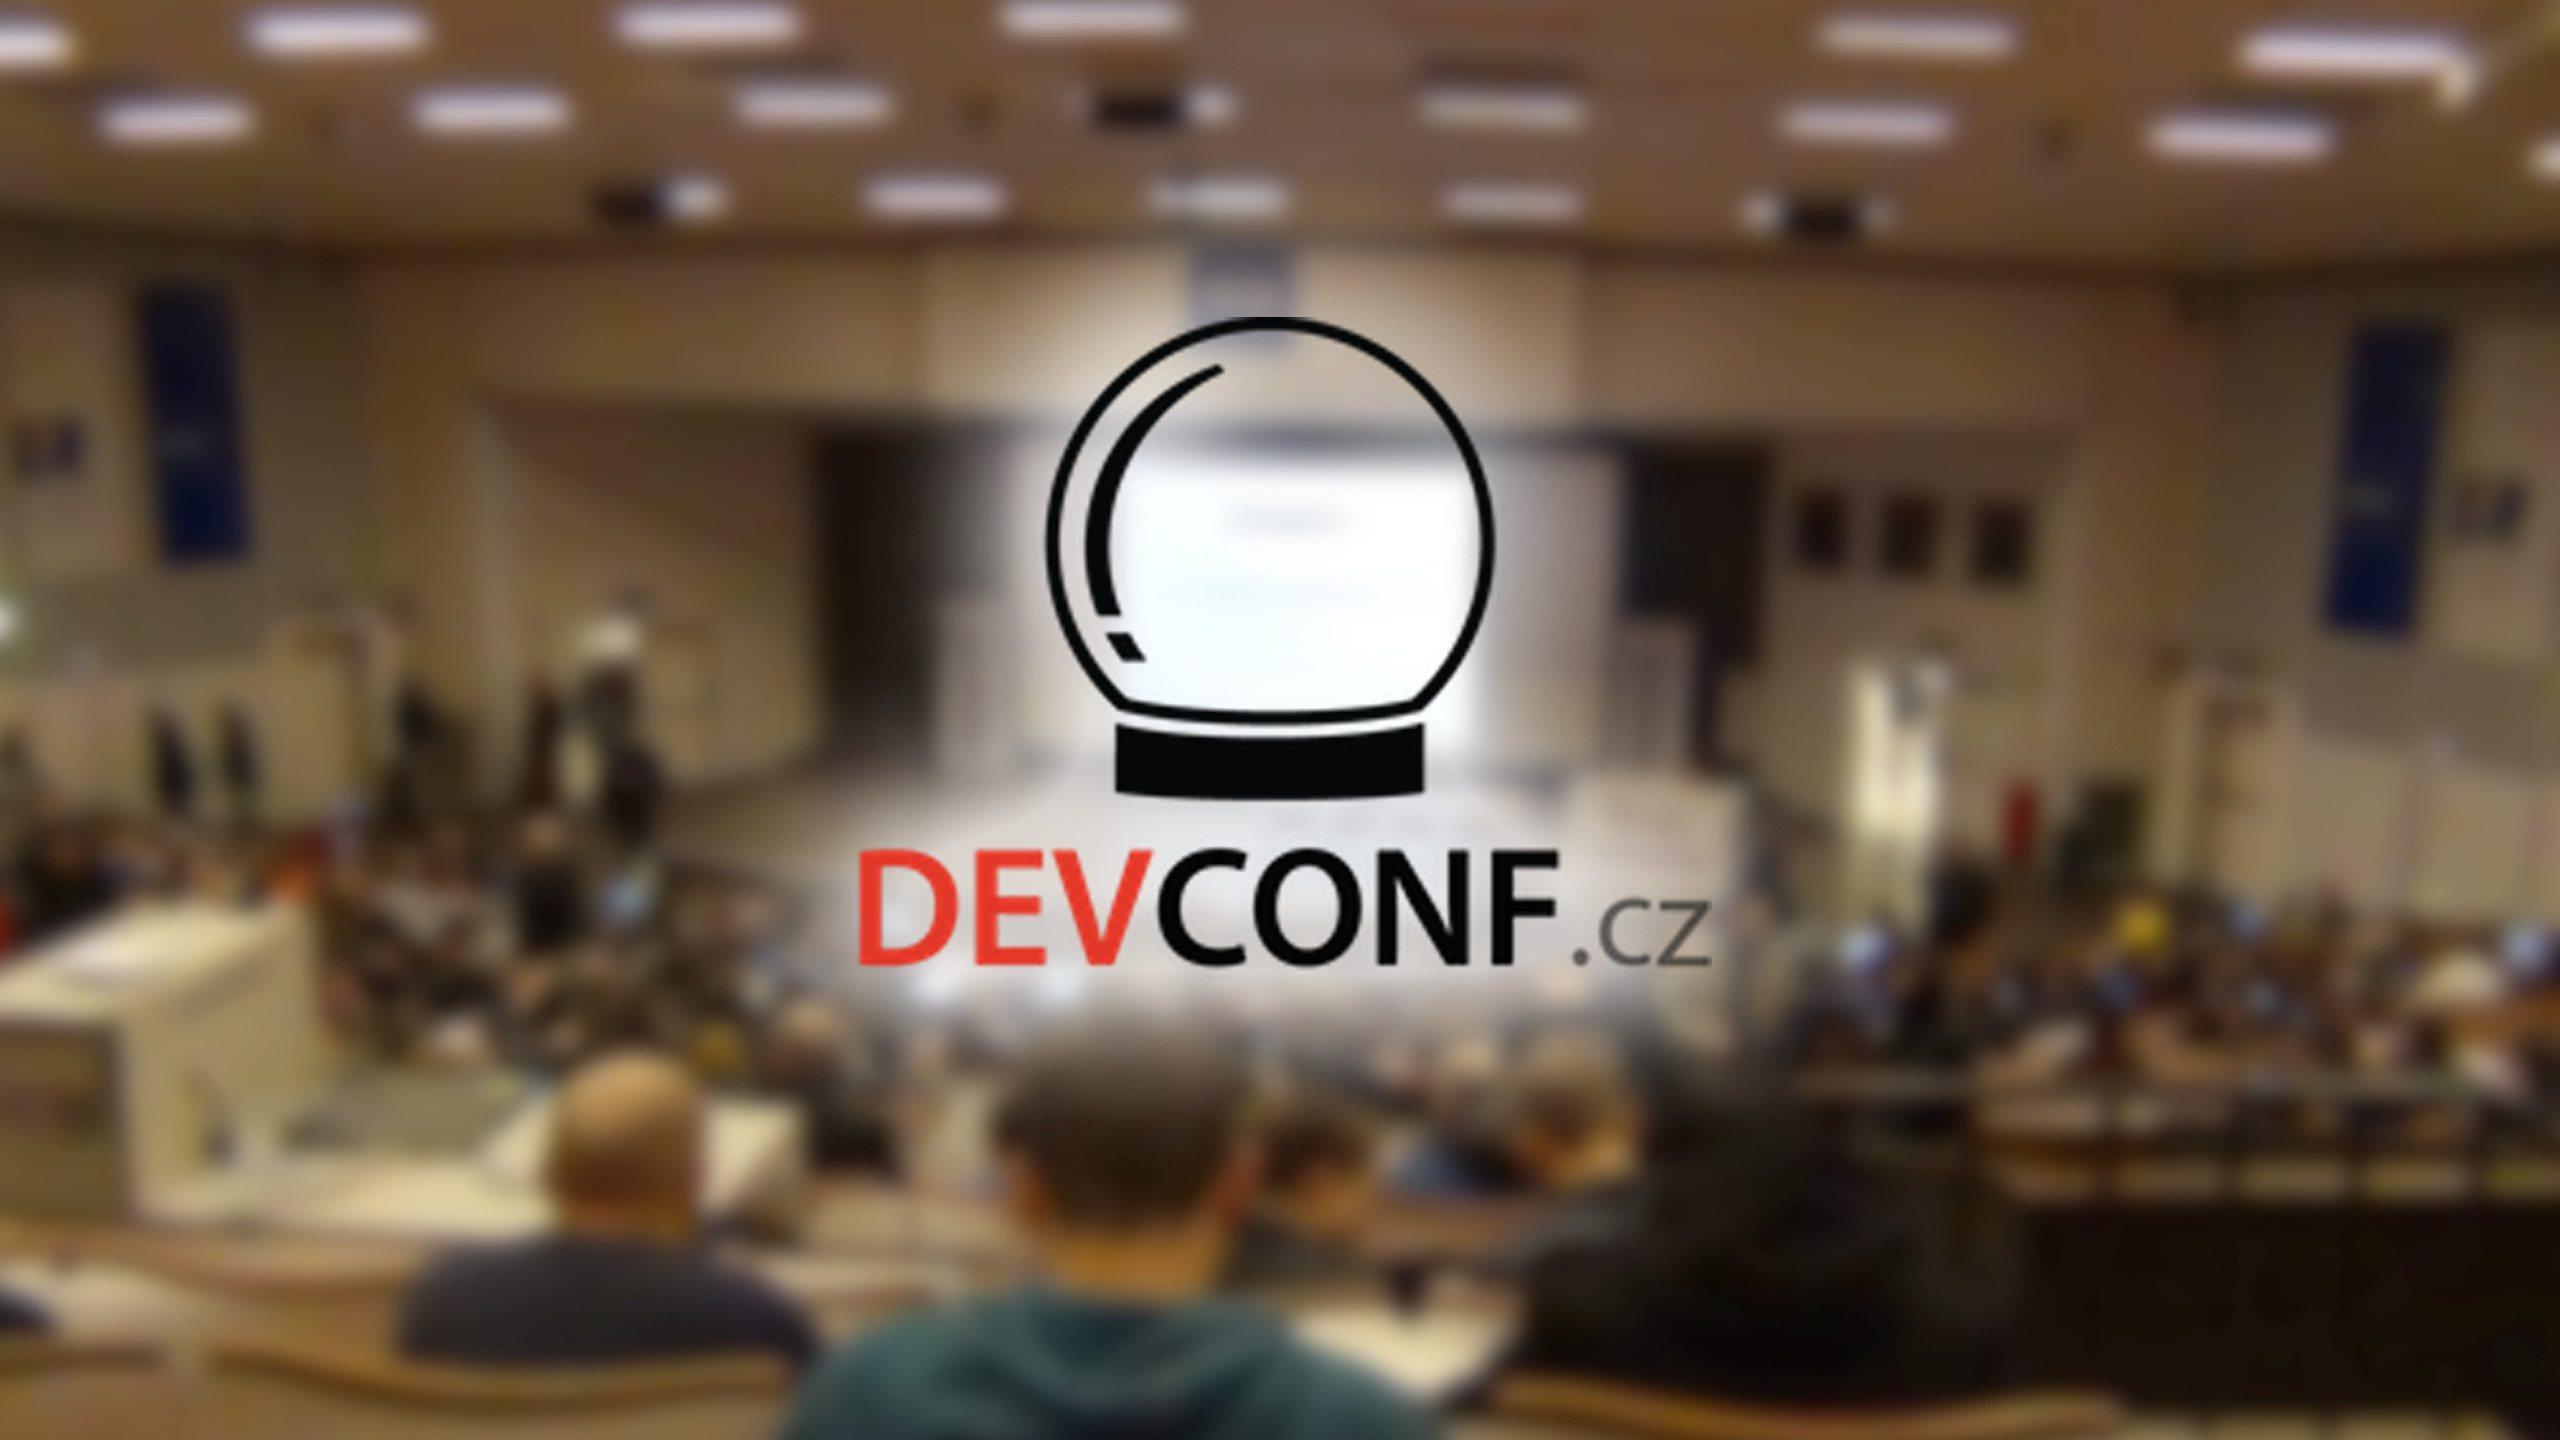 DevConf.cz - slider